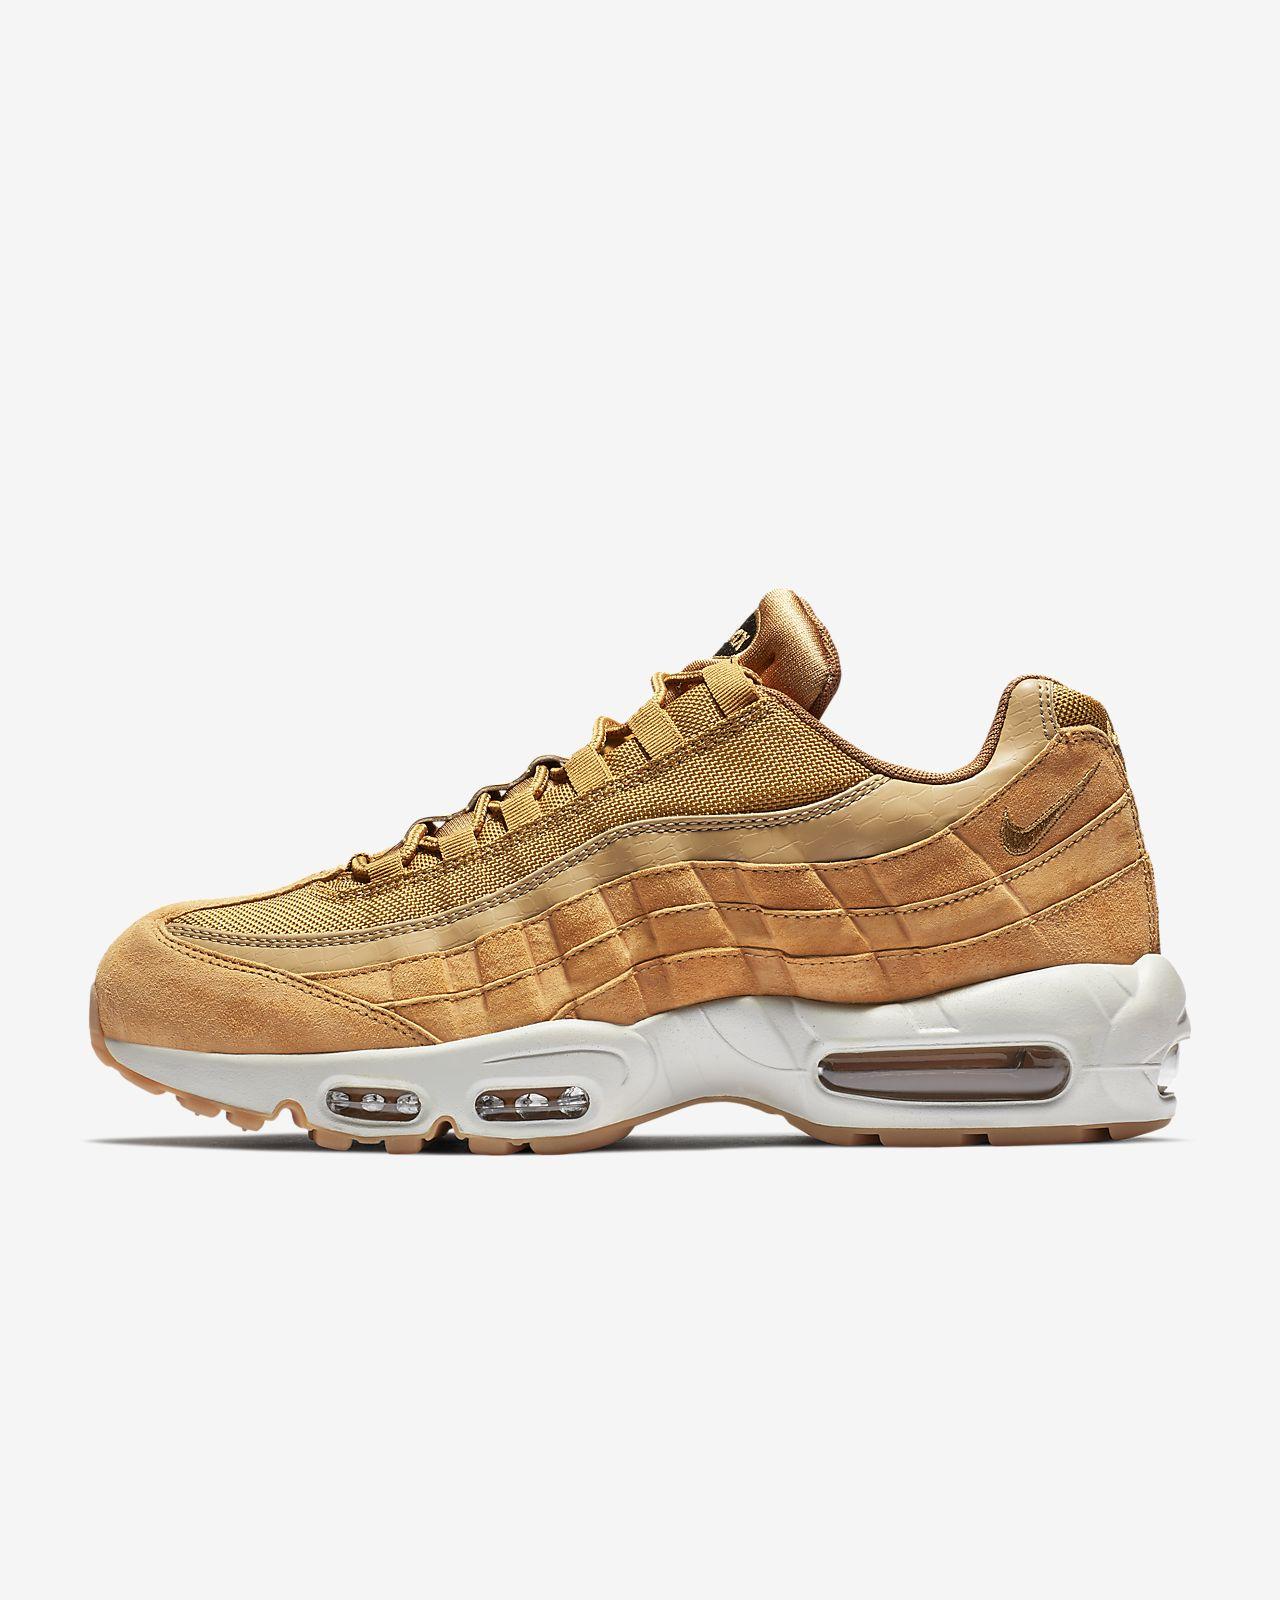 7470509e917 Nike Air Max 95 SE Men s Shoe. Nike.com SG